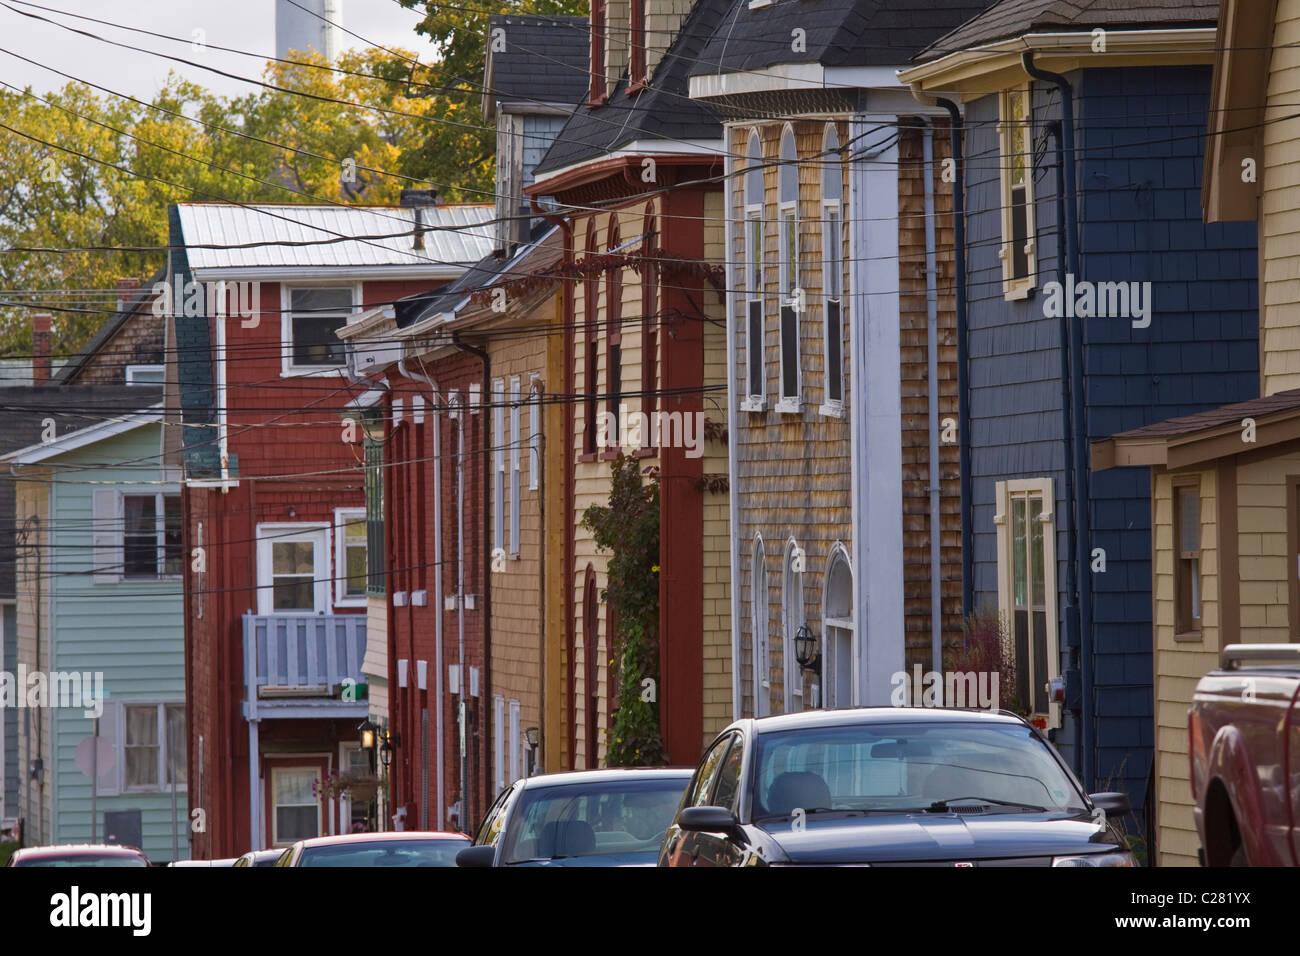 Historic old neighbourhoods in Charlottetown, Prince Edward Island, Canada - Stock Image